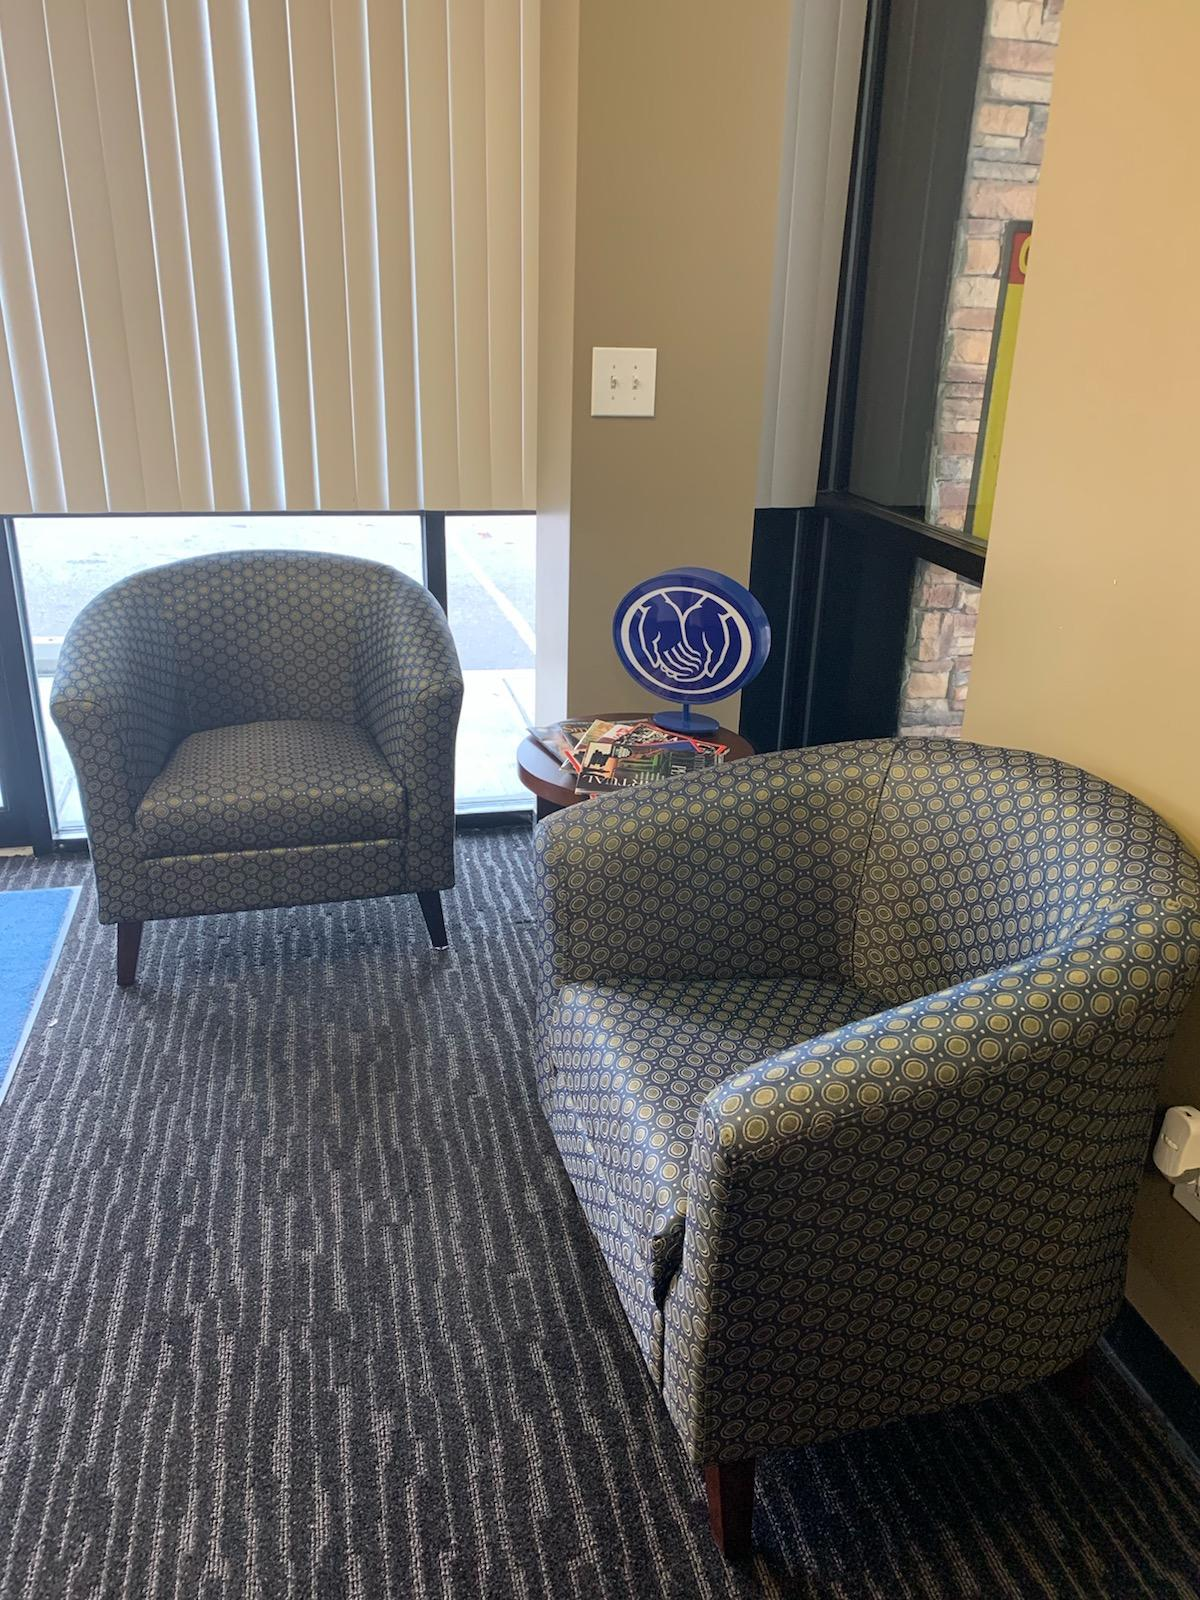 Allstate Insurance Agent: Nikki Smith image 3